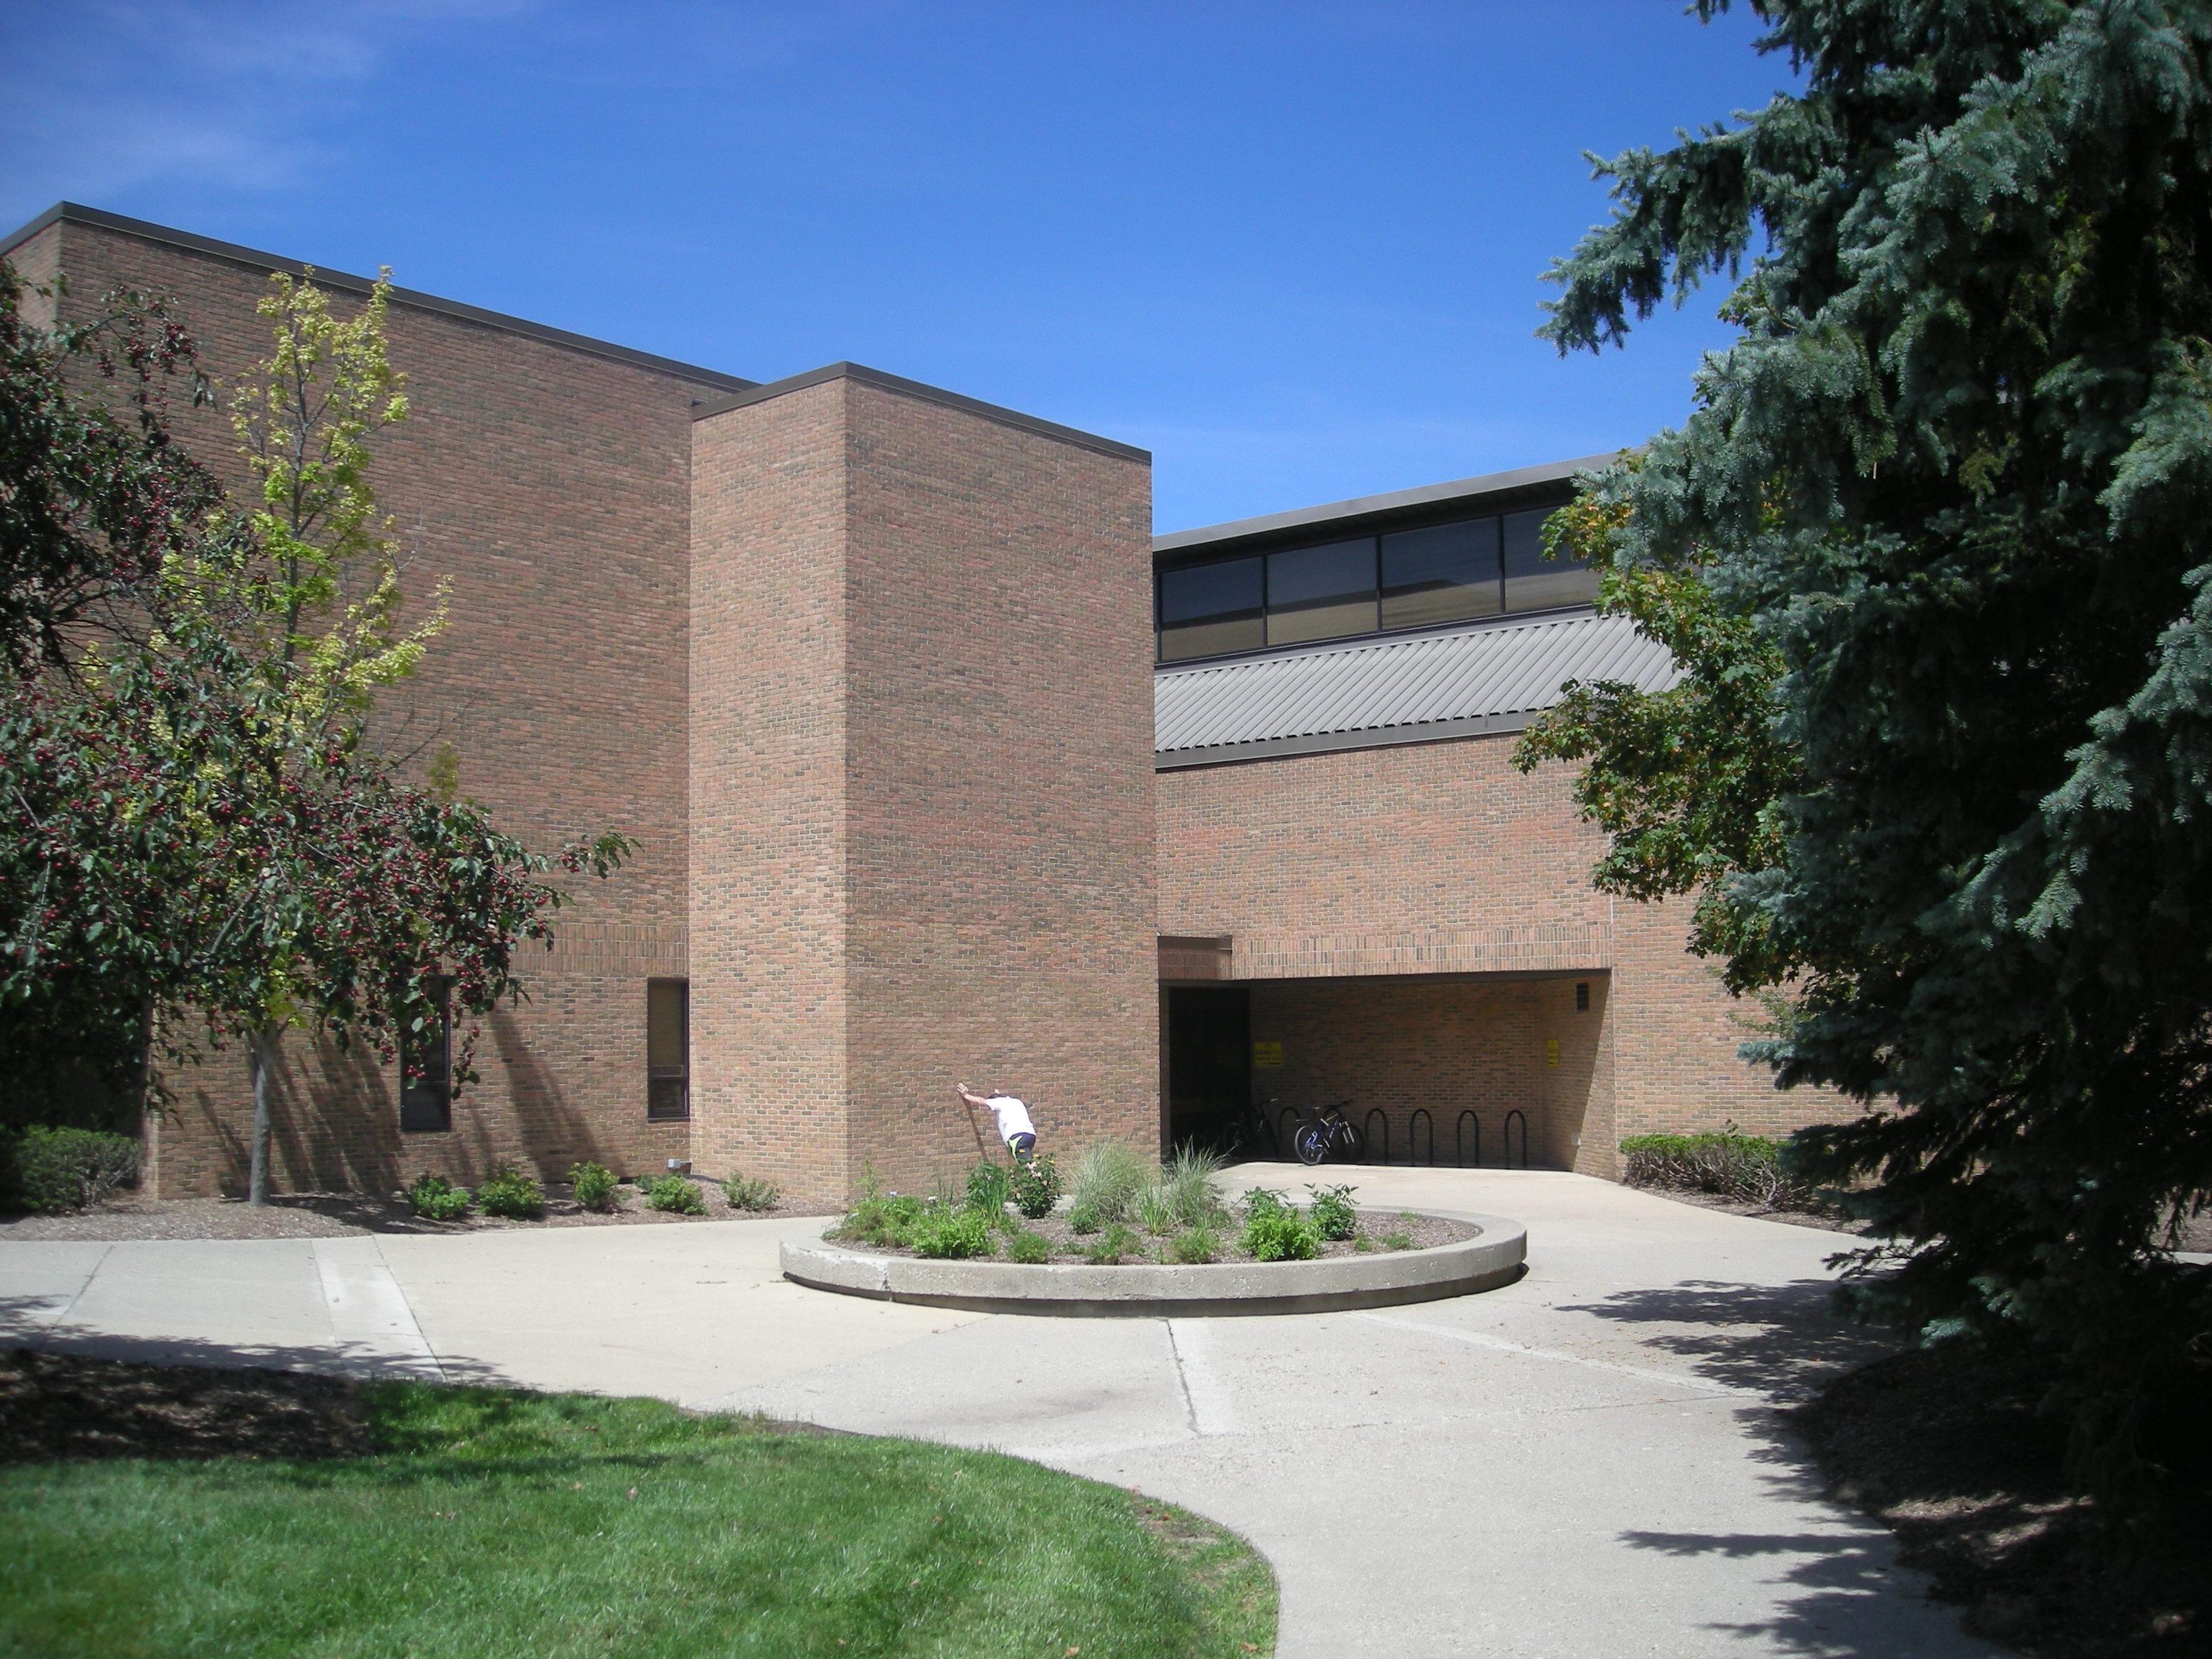 File University of Michigan August 2013 047 North Campus Recreation